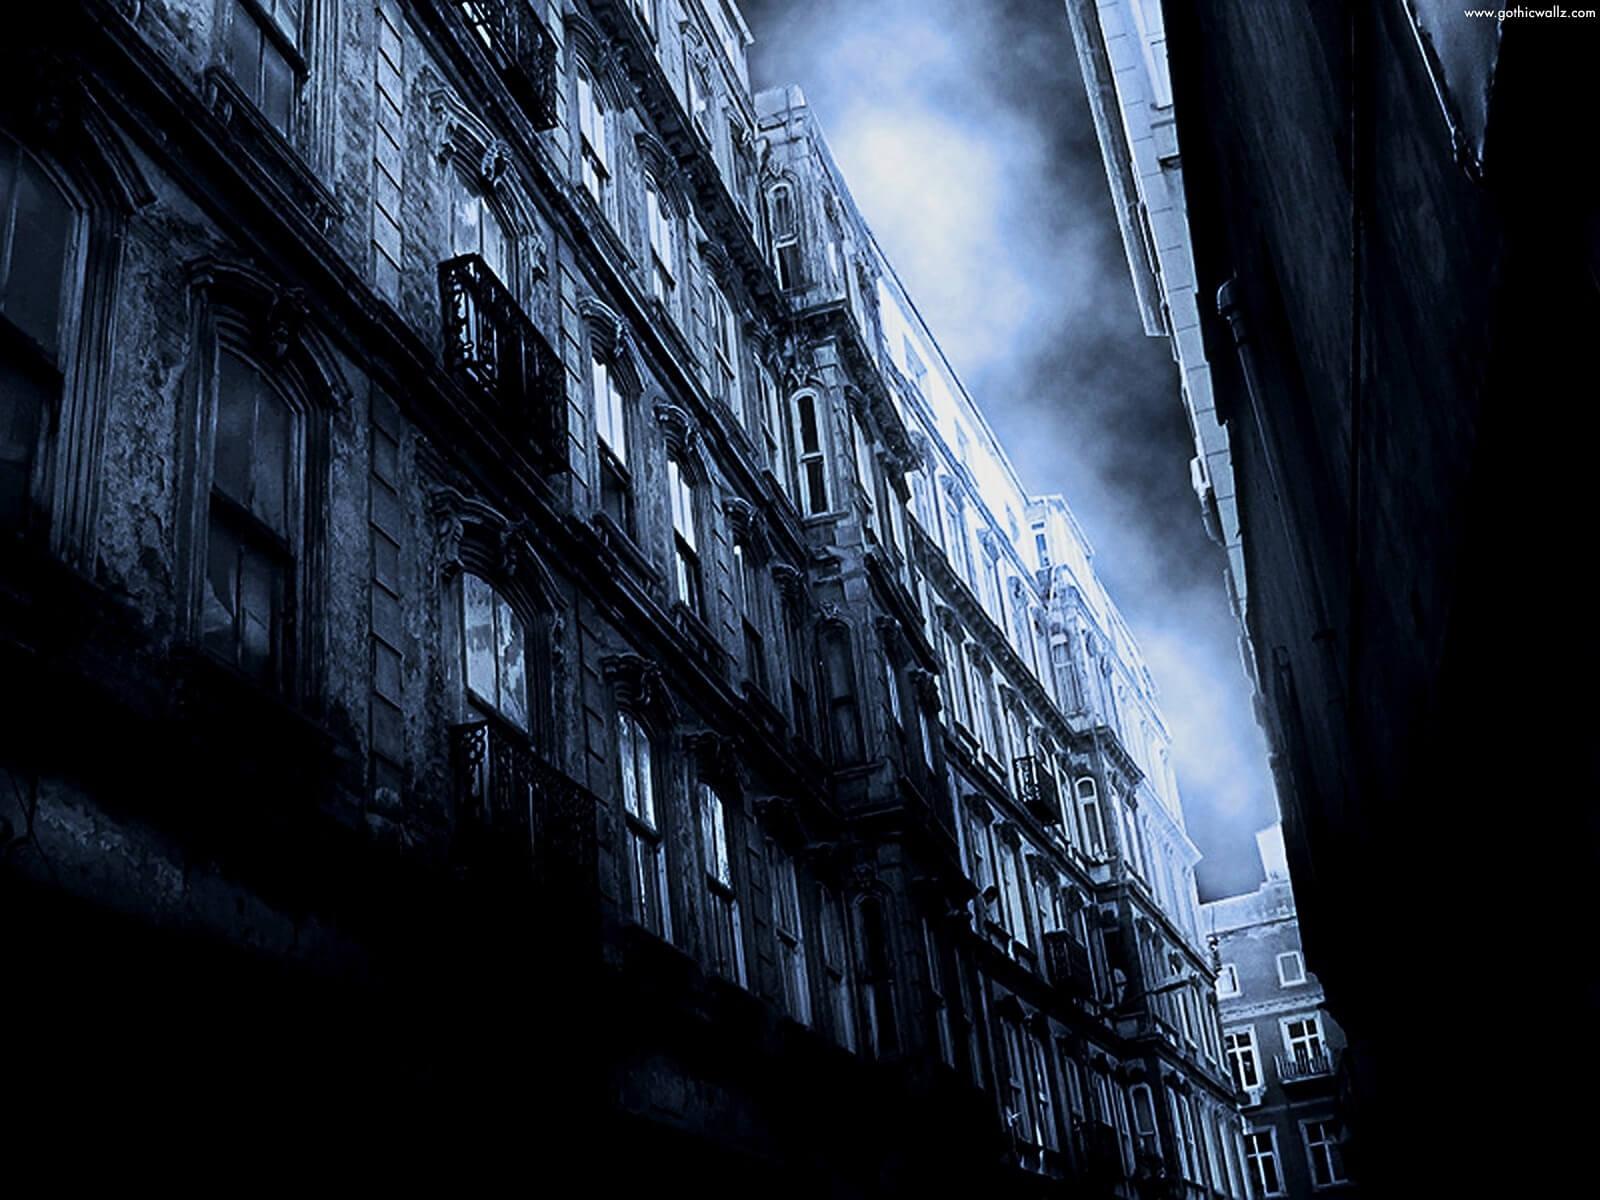 Supernatural Cities II: Gothic Cities